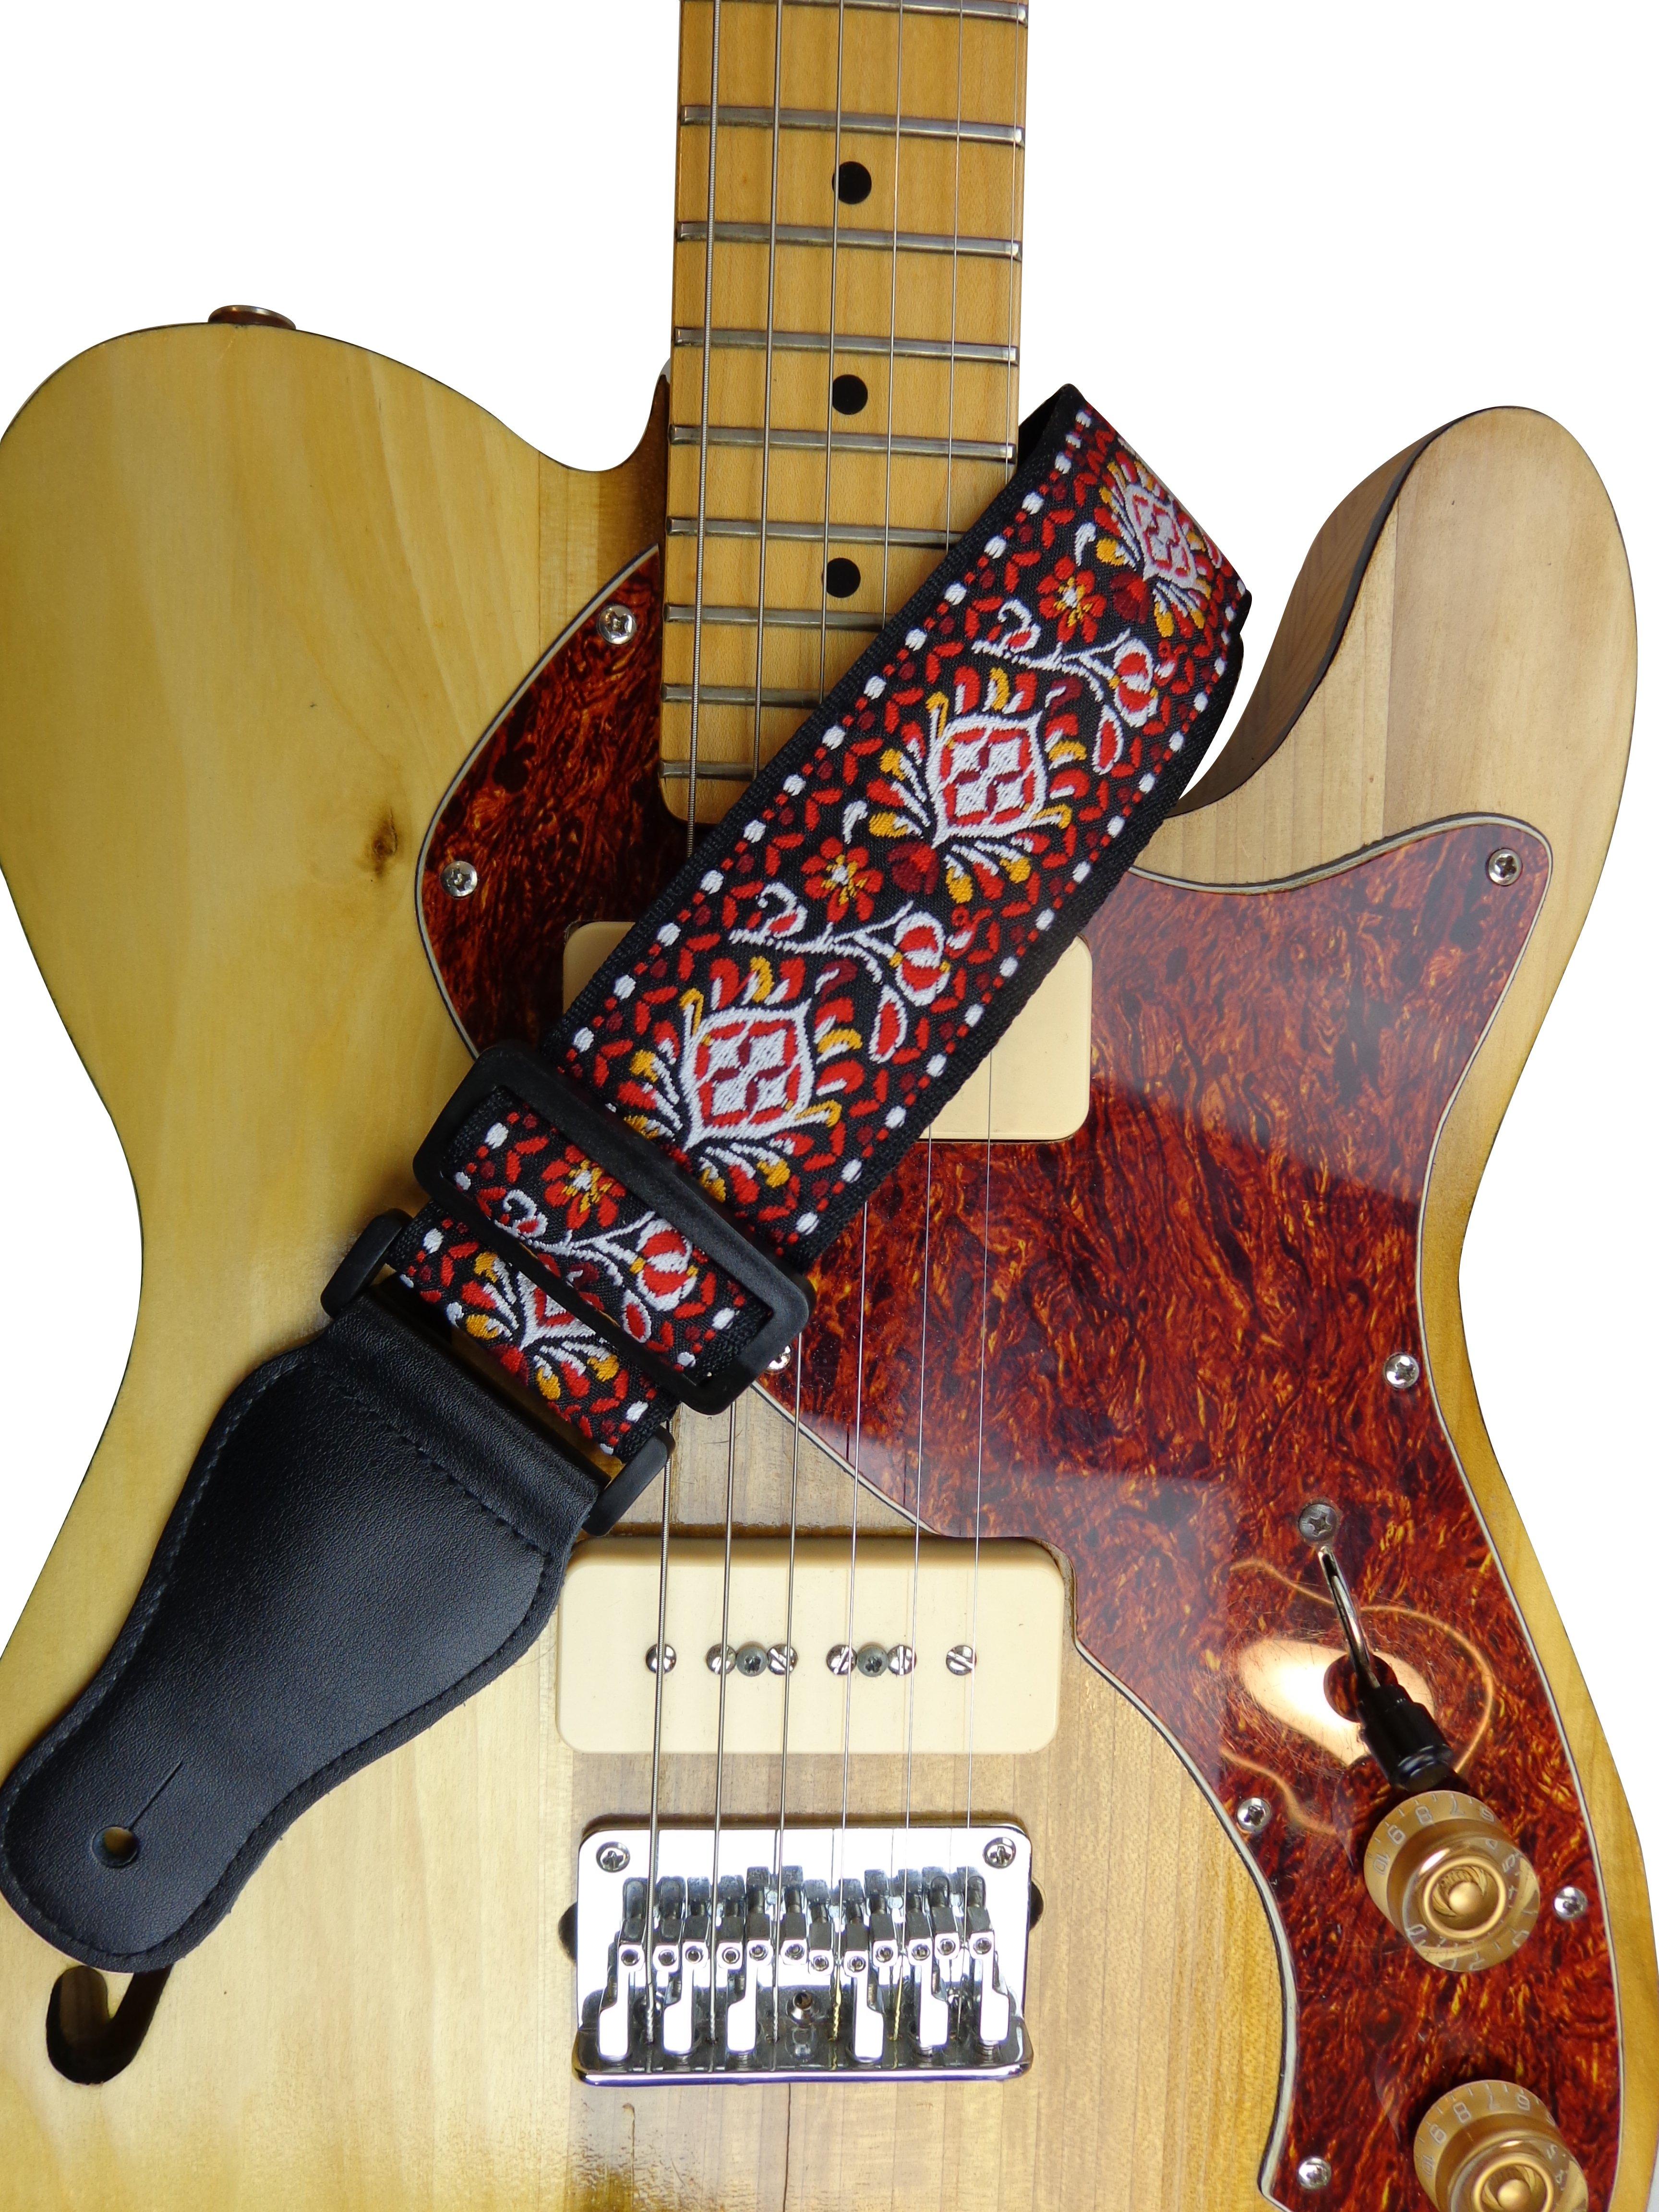 New-Retro-Vintage-Jacquard-Woven-Acoustic-Electric-Guitar-Strap thumbnail 54